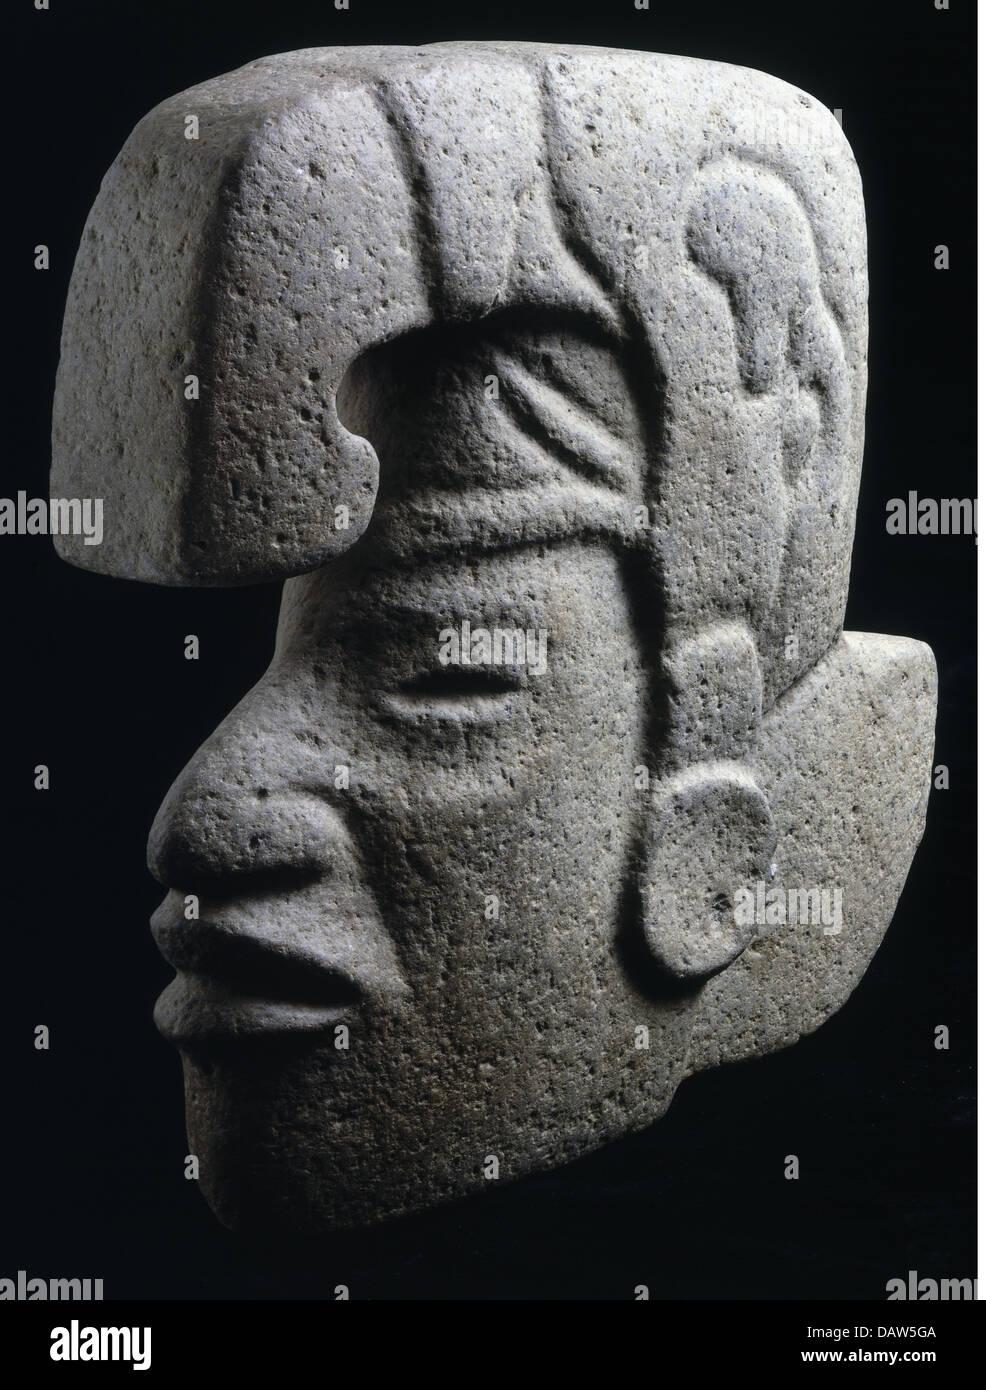 fine arts, Mesoamerica, stone sculpture, probably Aztec original, Mexico, 10th - 15th century, Aztec, Aztecs, Central Stock Photo